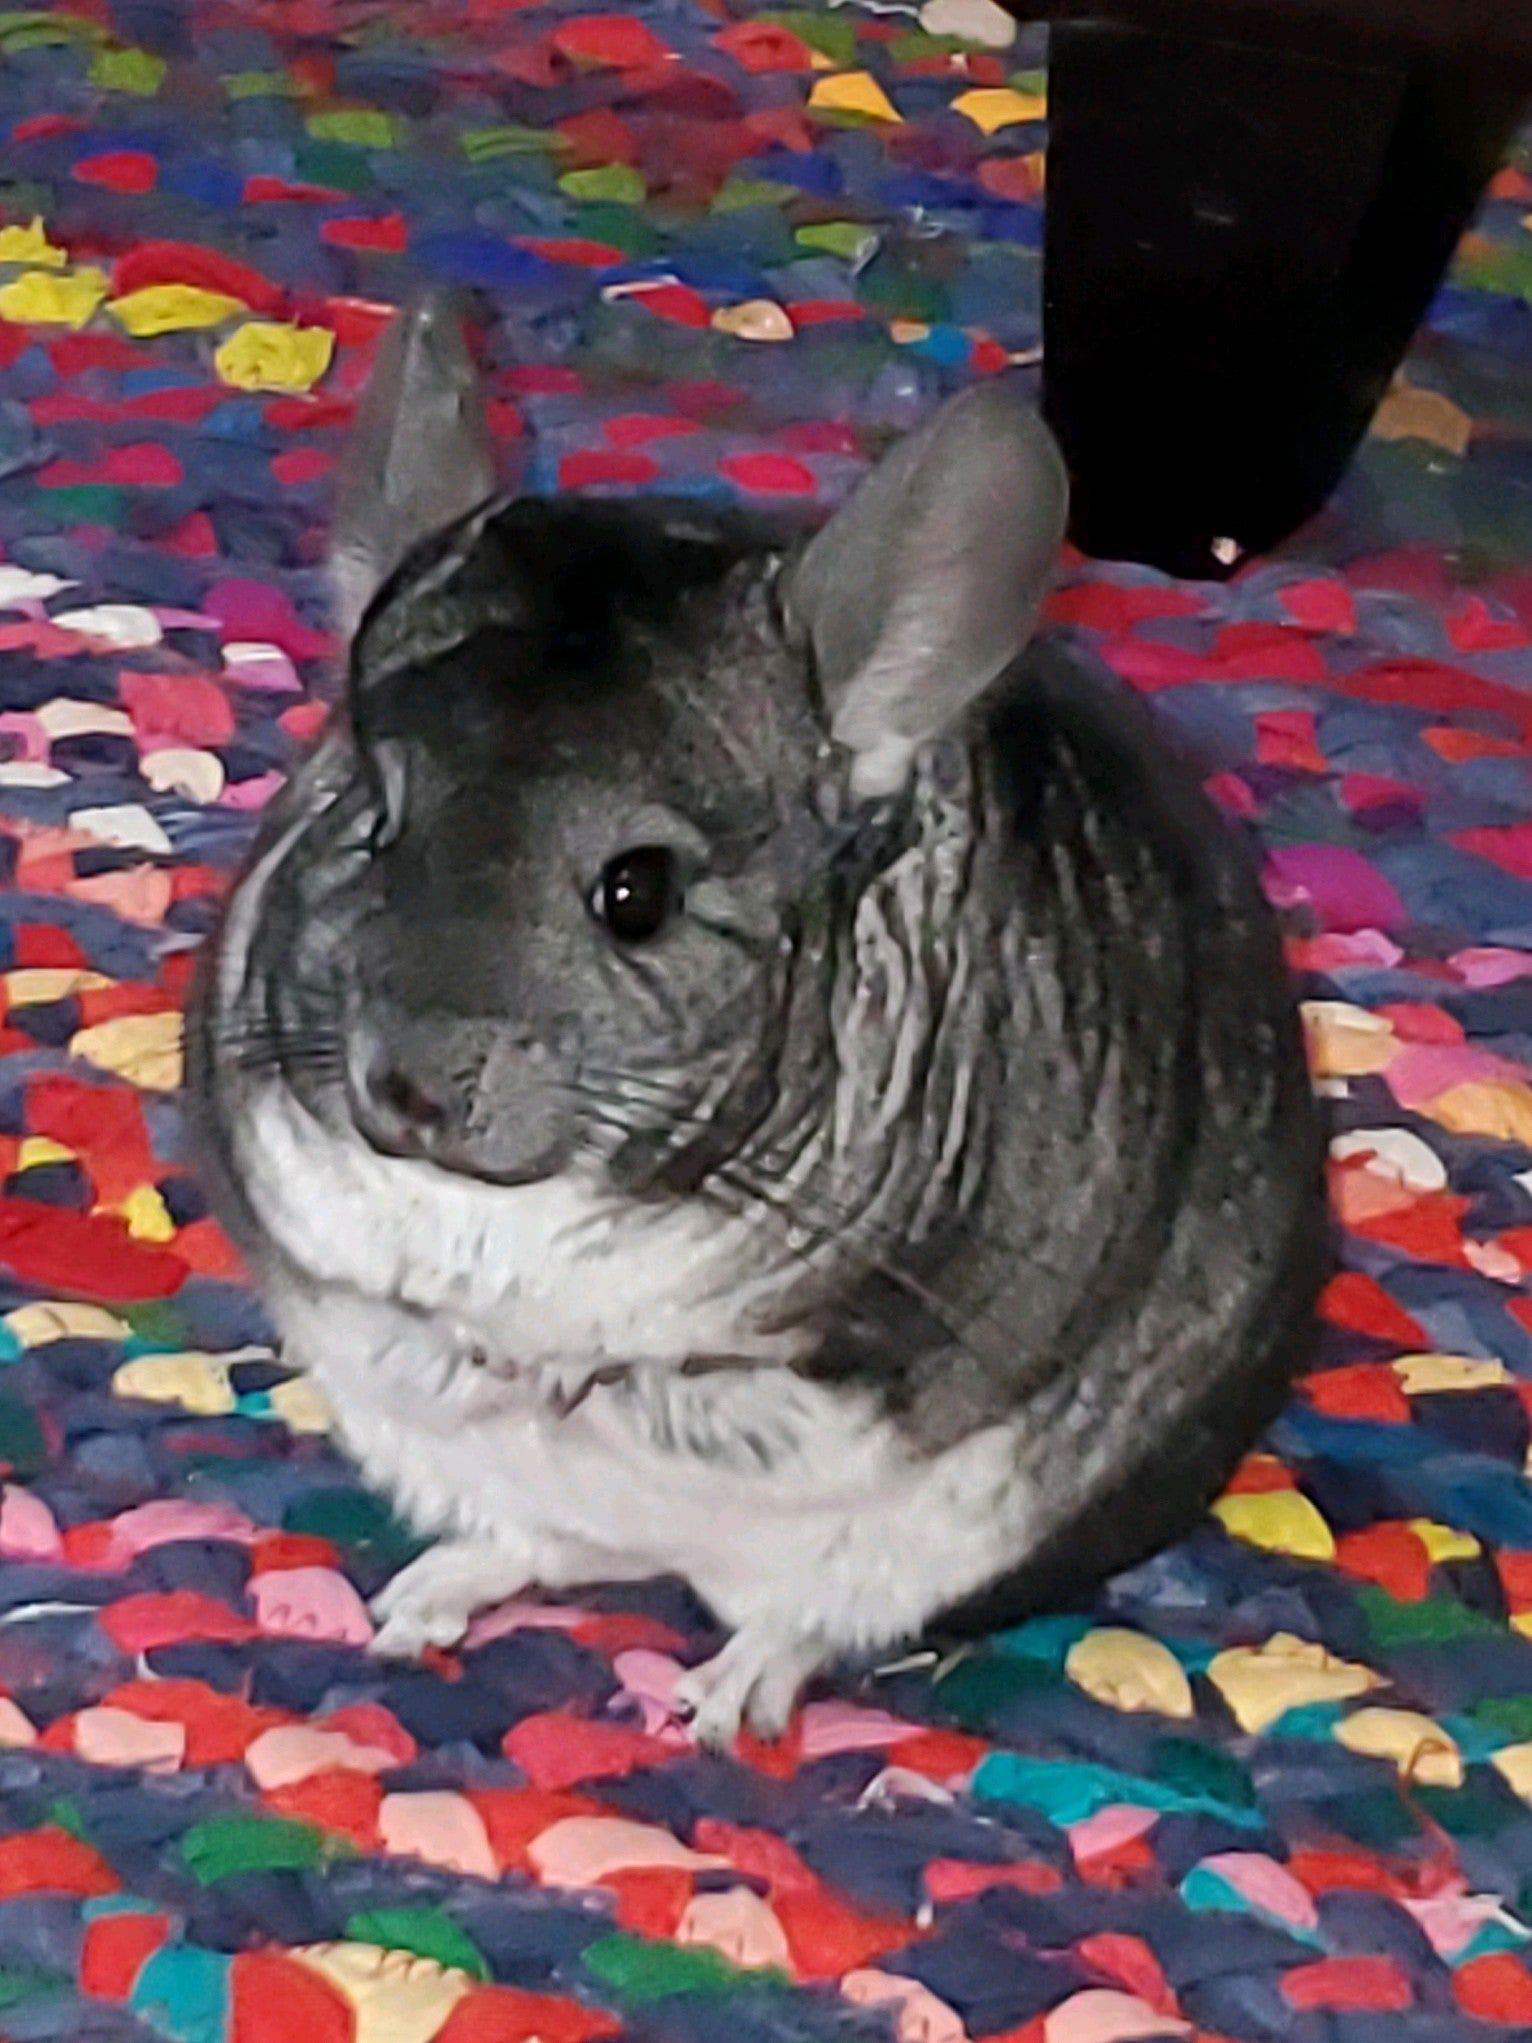 Chinchillas Of Reddit Meet Radnarok Www Chinchillastories Com Pets Animals Mammals Rodents Chinchilla In 2020 Cute Little Animals Pet Owners Animals